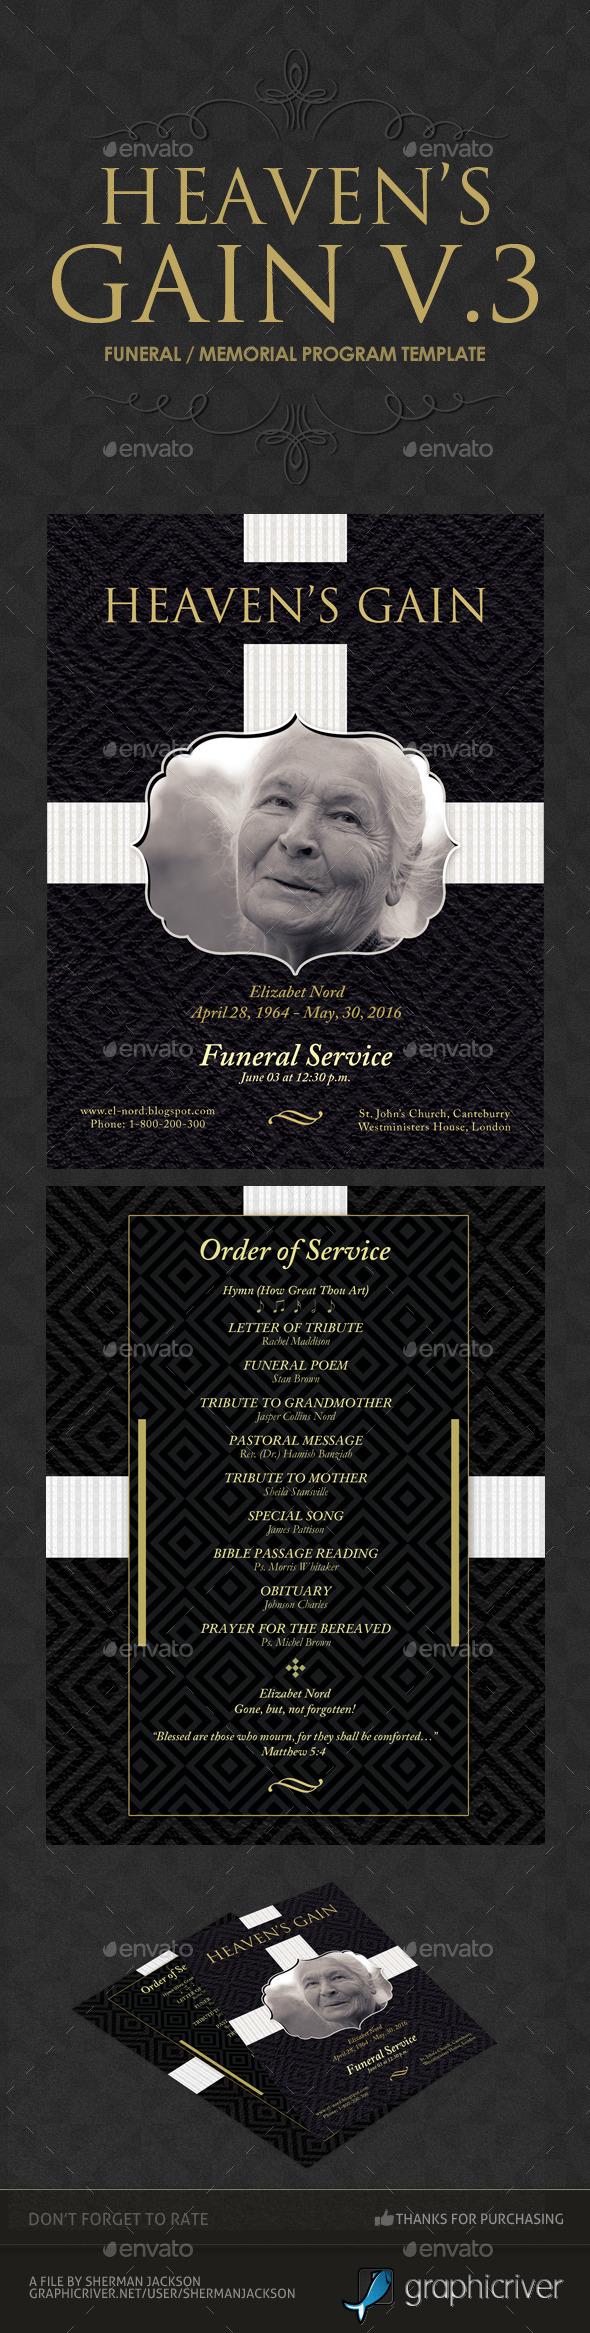 Heaven's Gain Funeral Memorial Program V.3